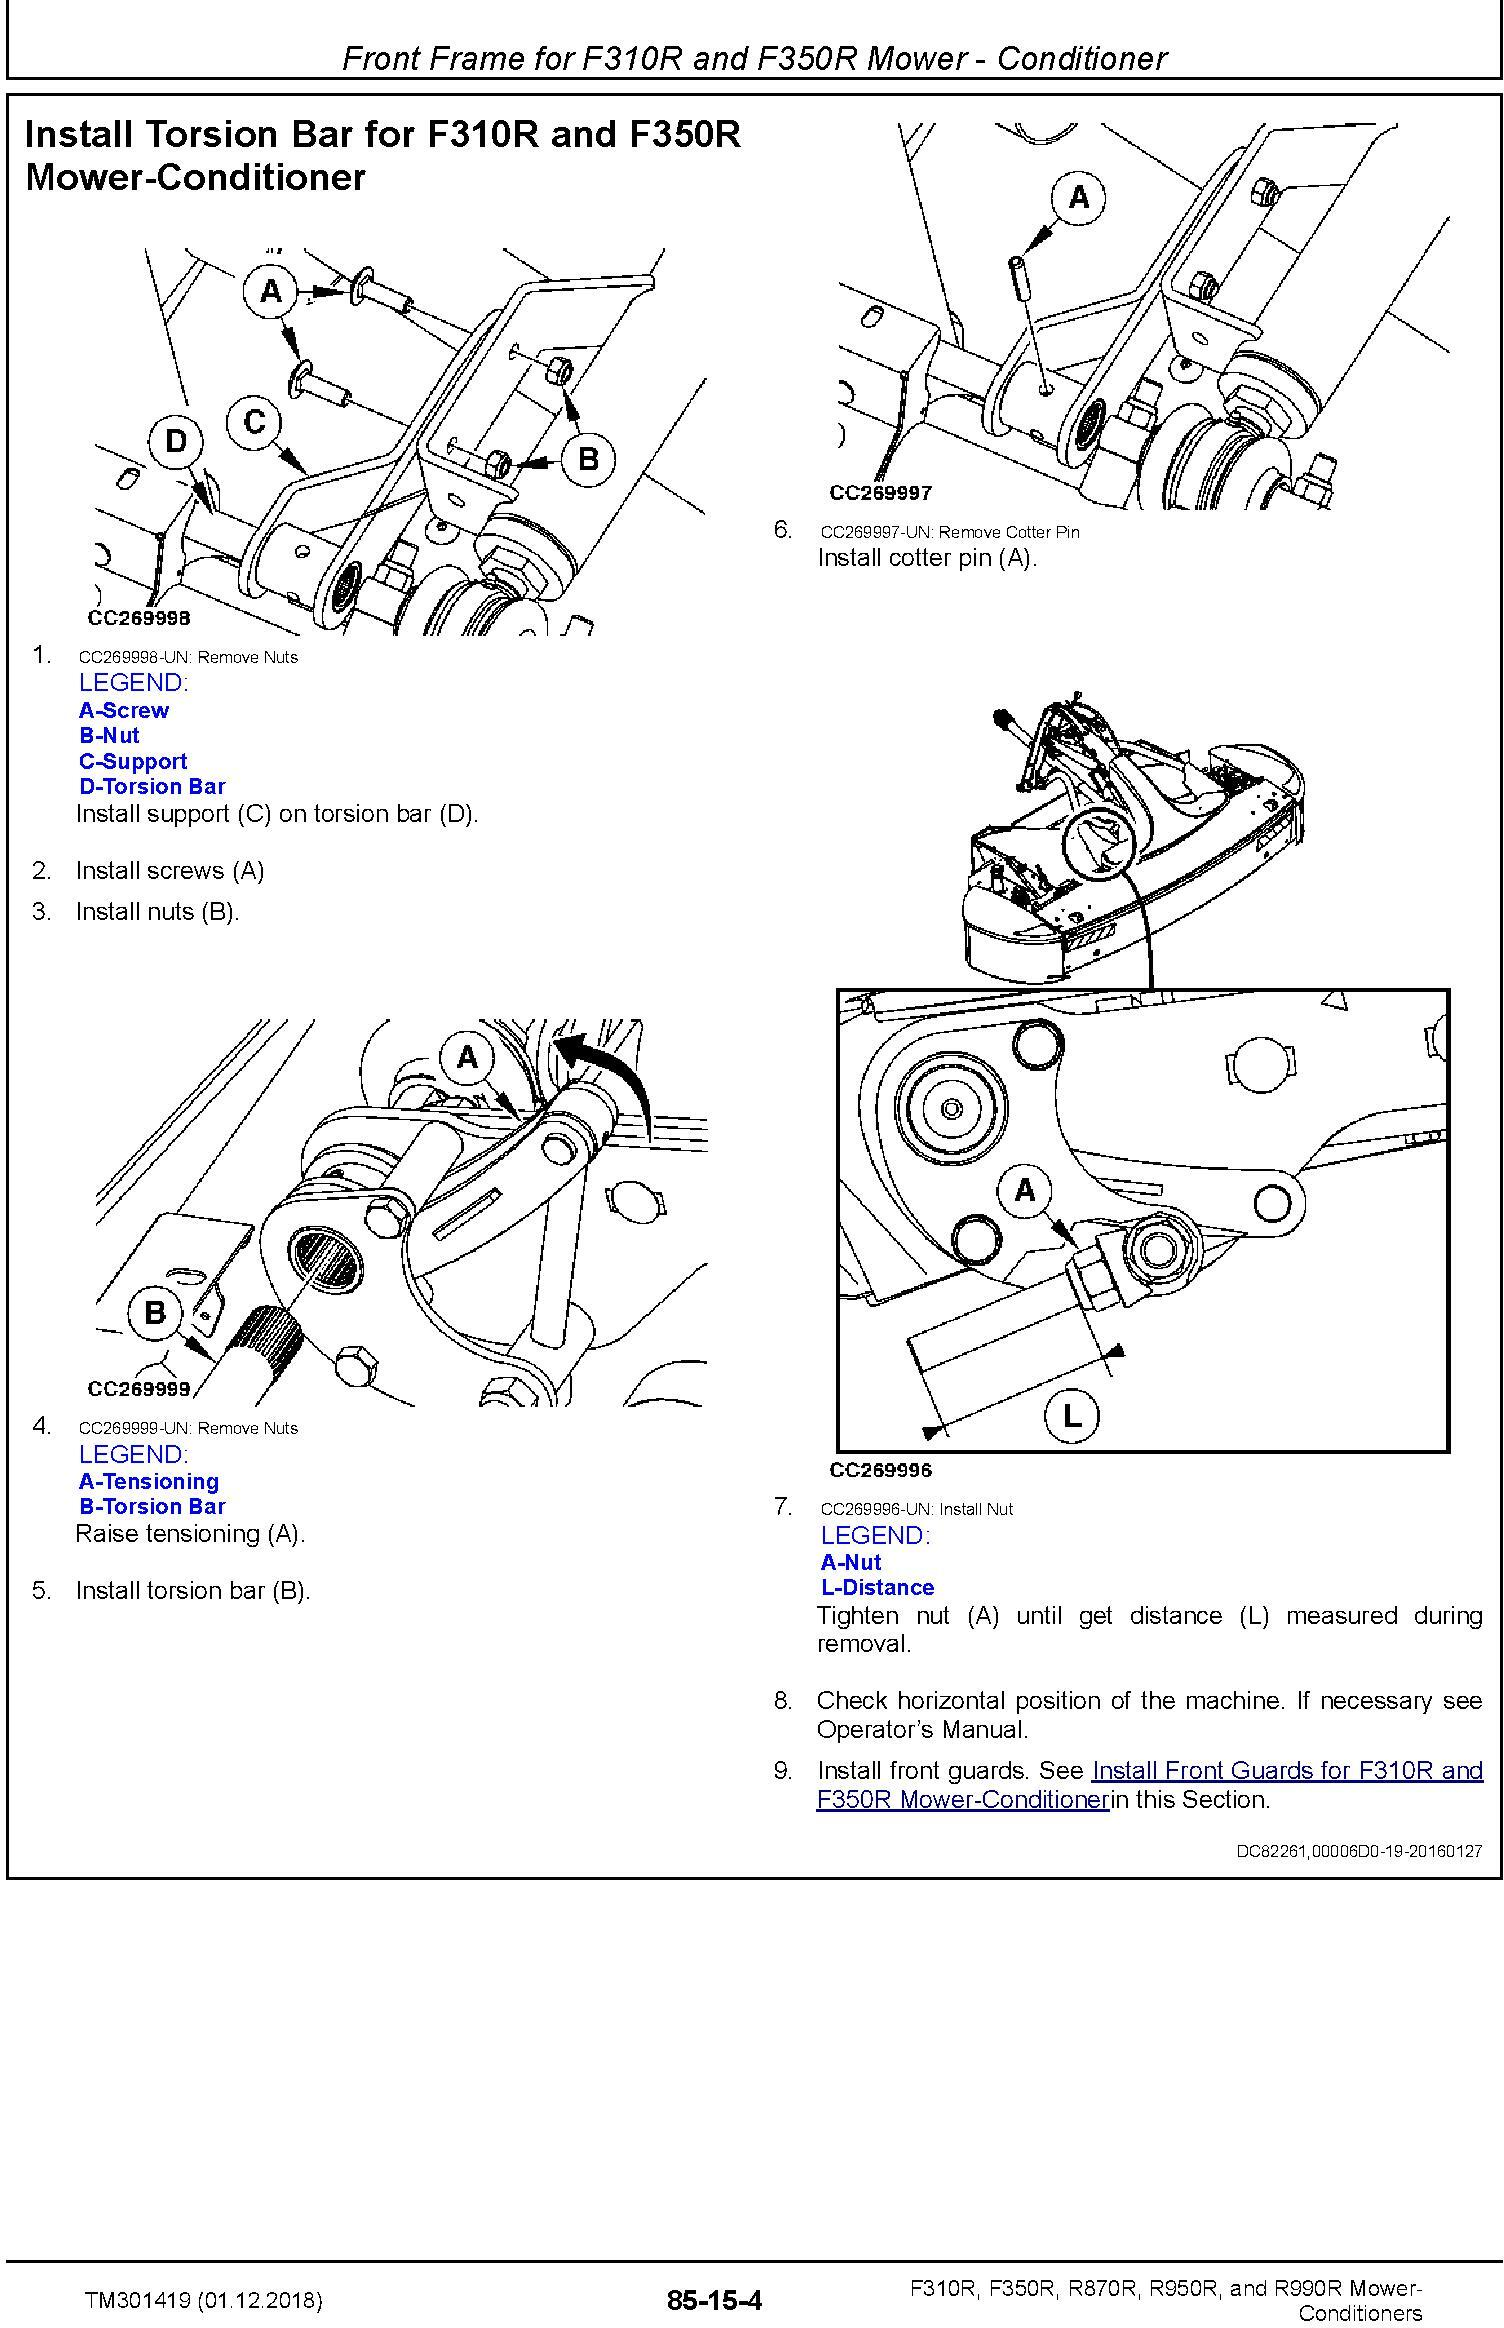 John Deere F310R, F350R, R870R, R950R and R990R Mower-Conditioners Technical Manual (TM301419) - 3